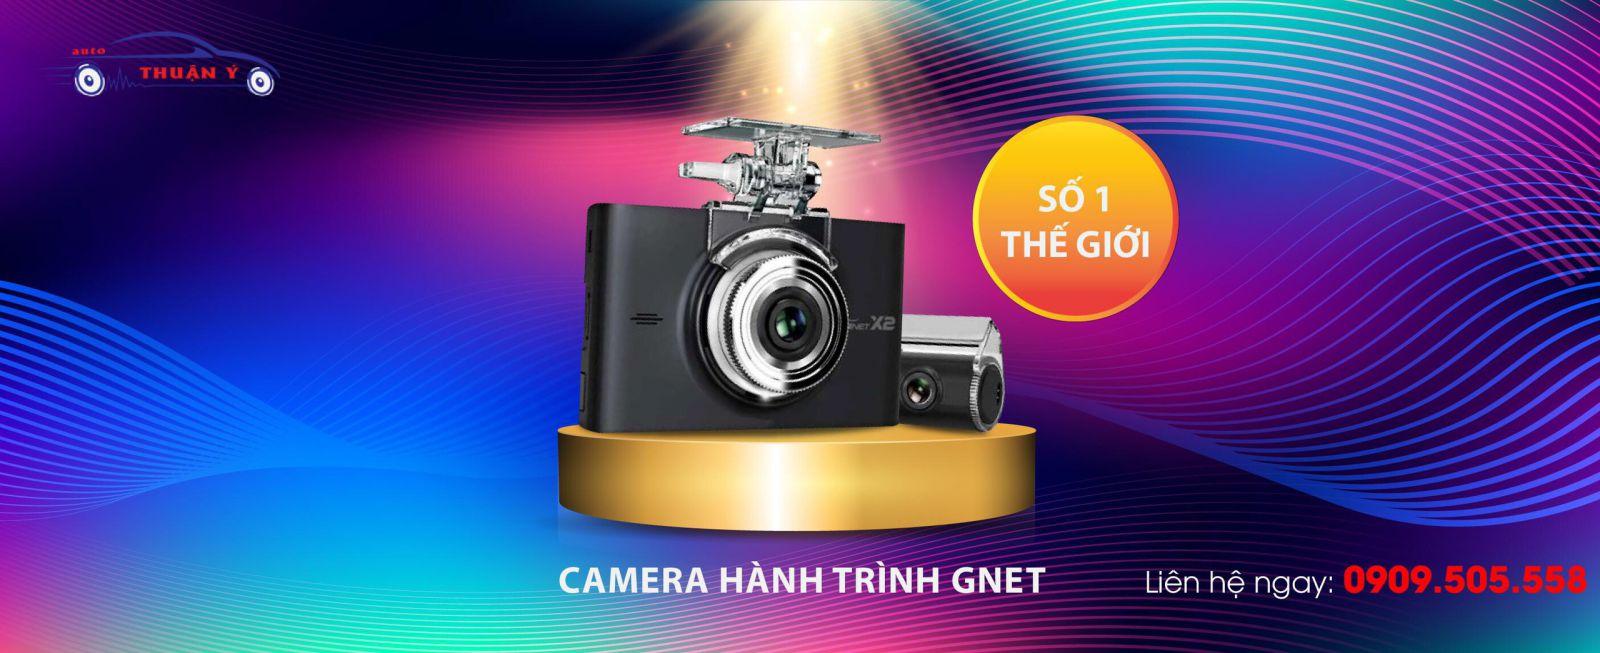 camera-hanh-trinh-gnet-han-quoc